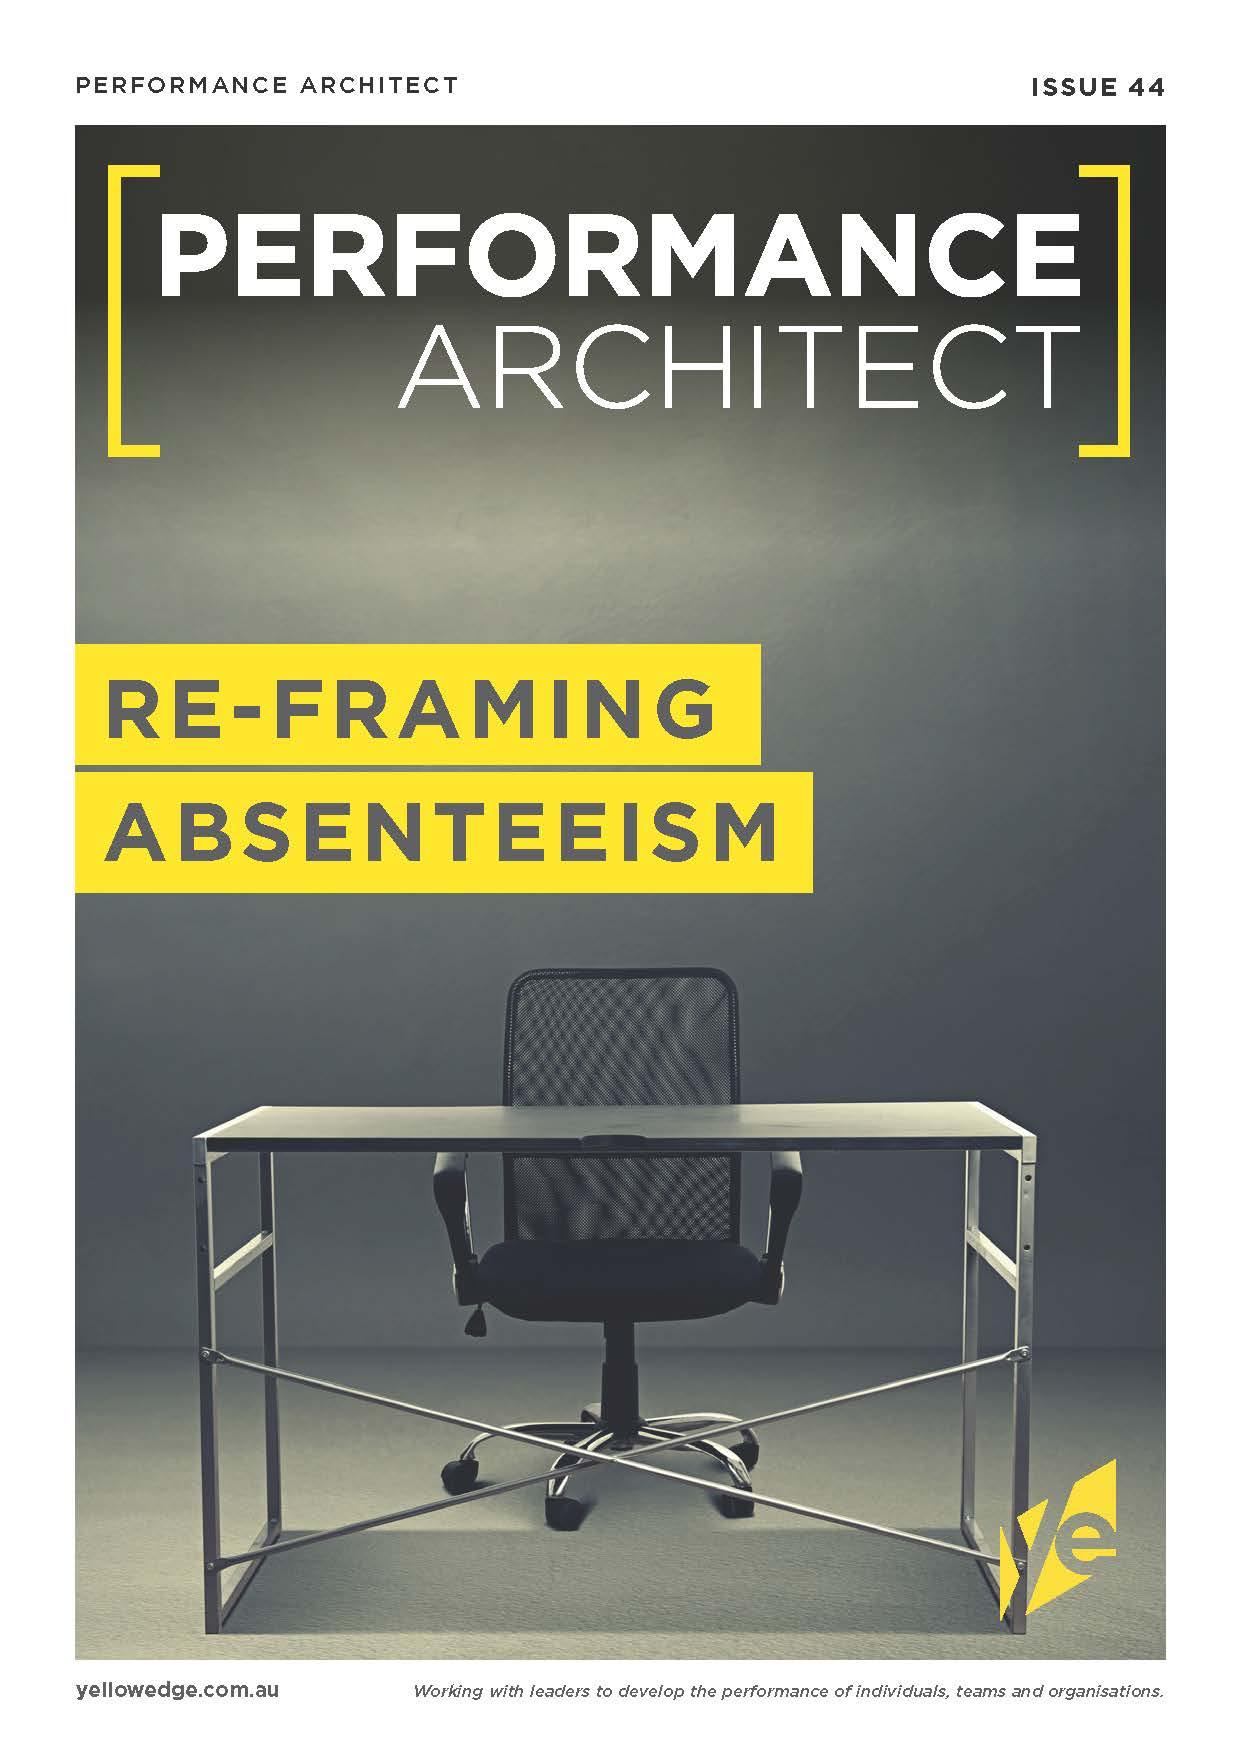 Re-framing absenteeism